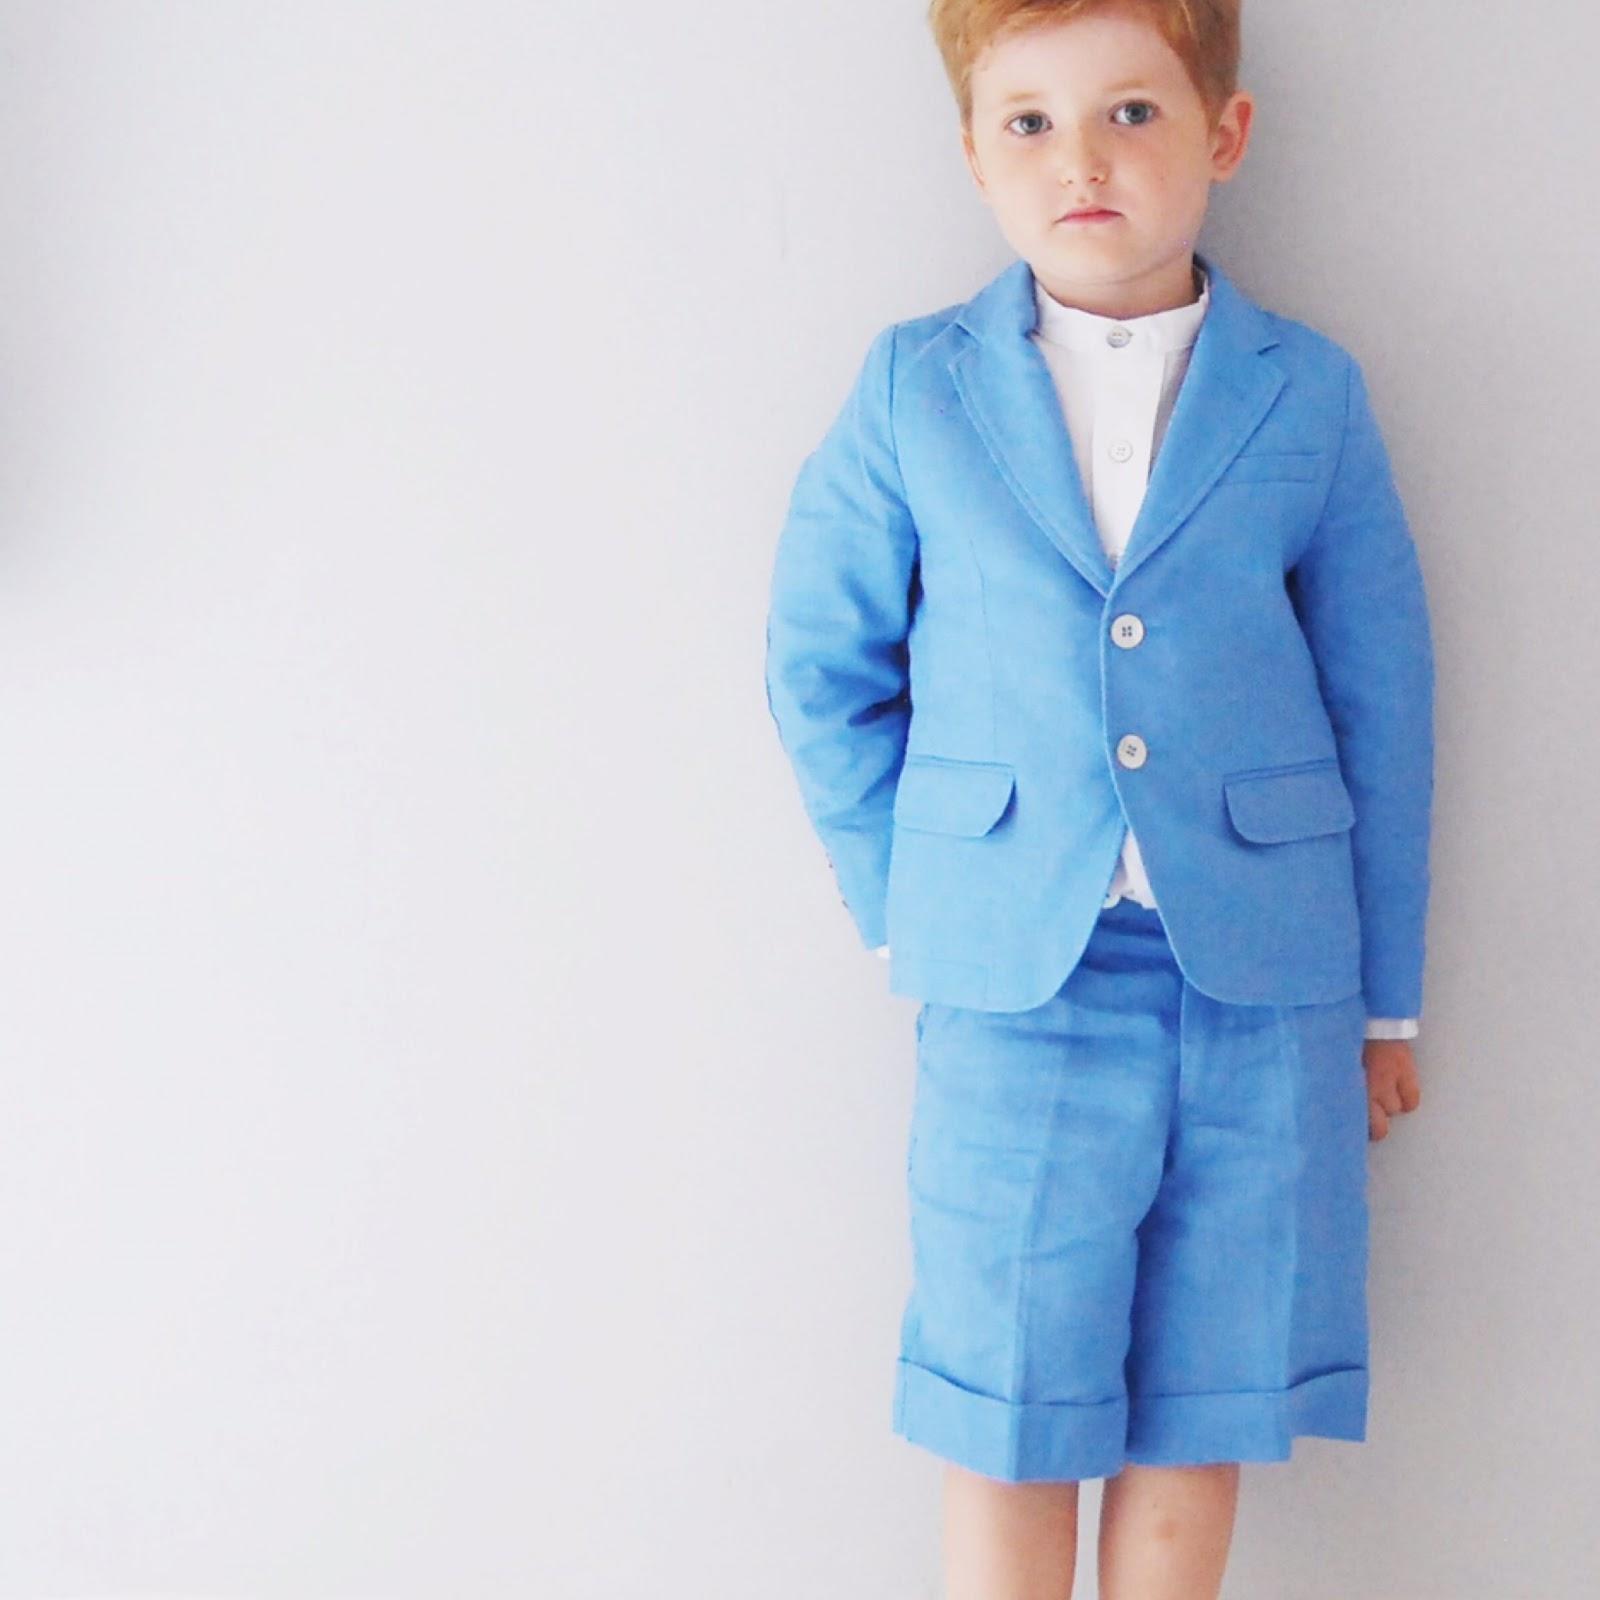 Little Boys In Little Linens Suits. | Brick Dust & Glitter